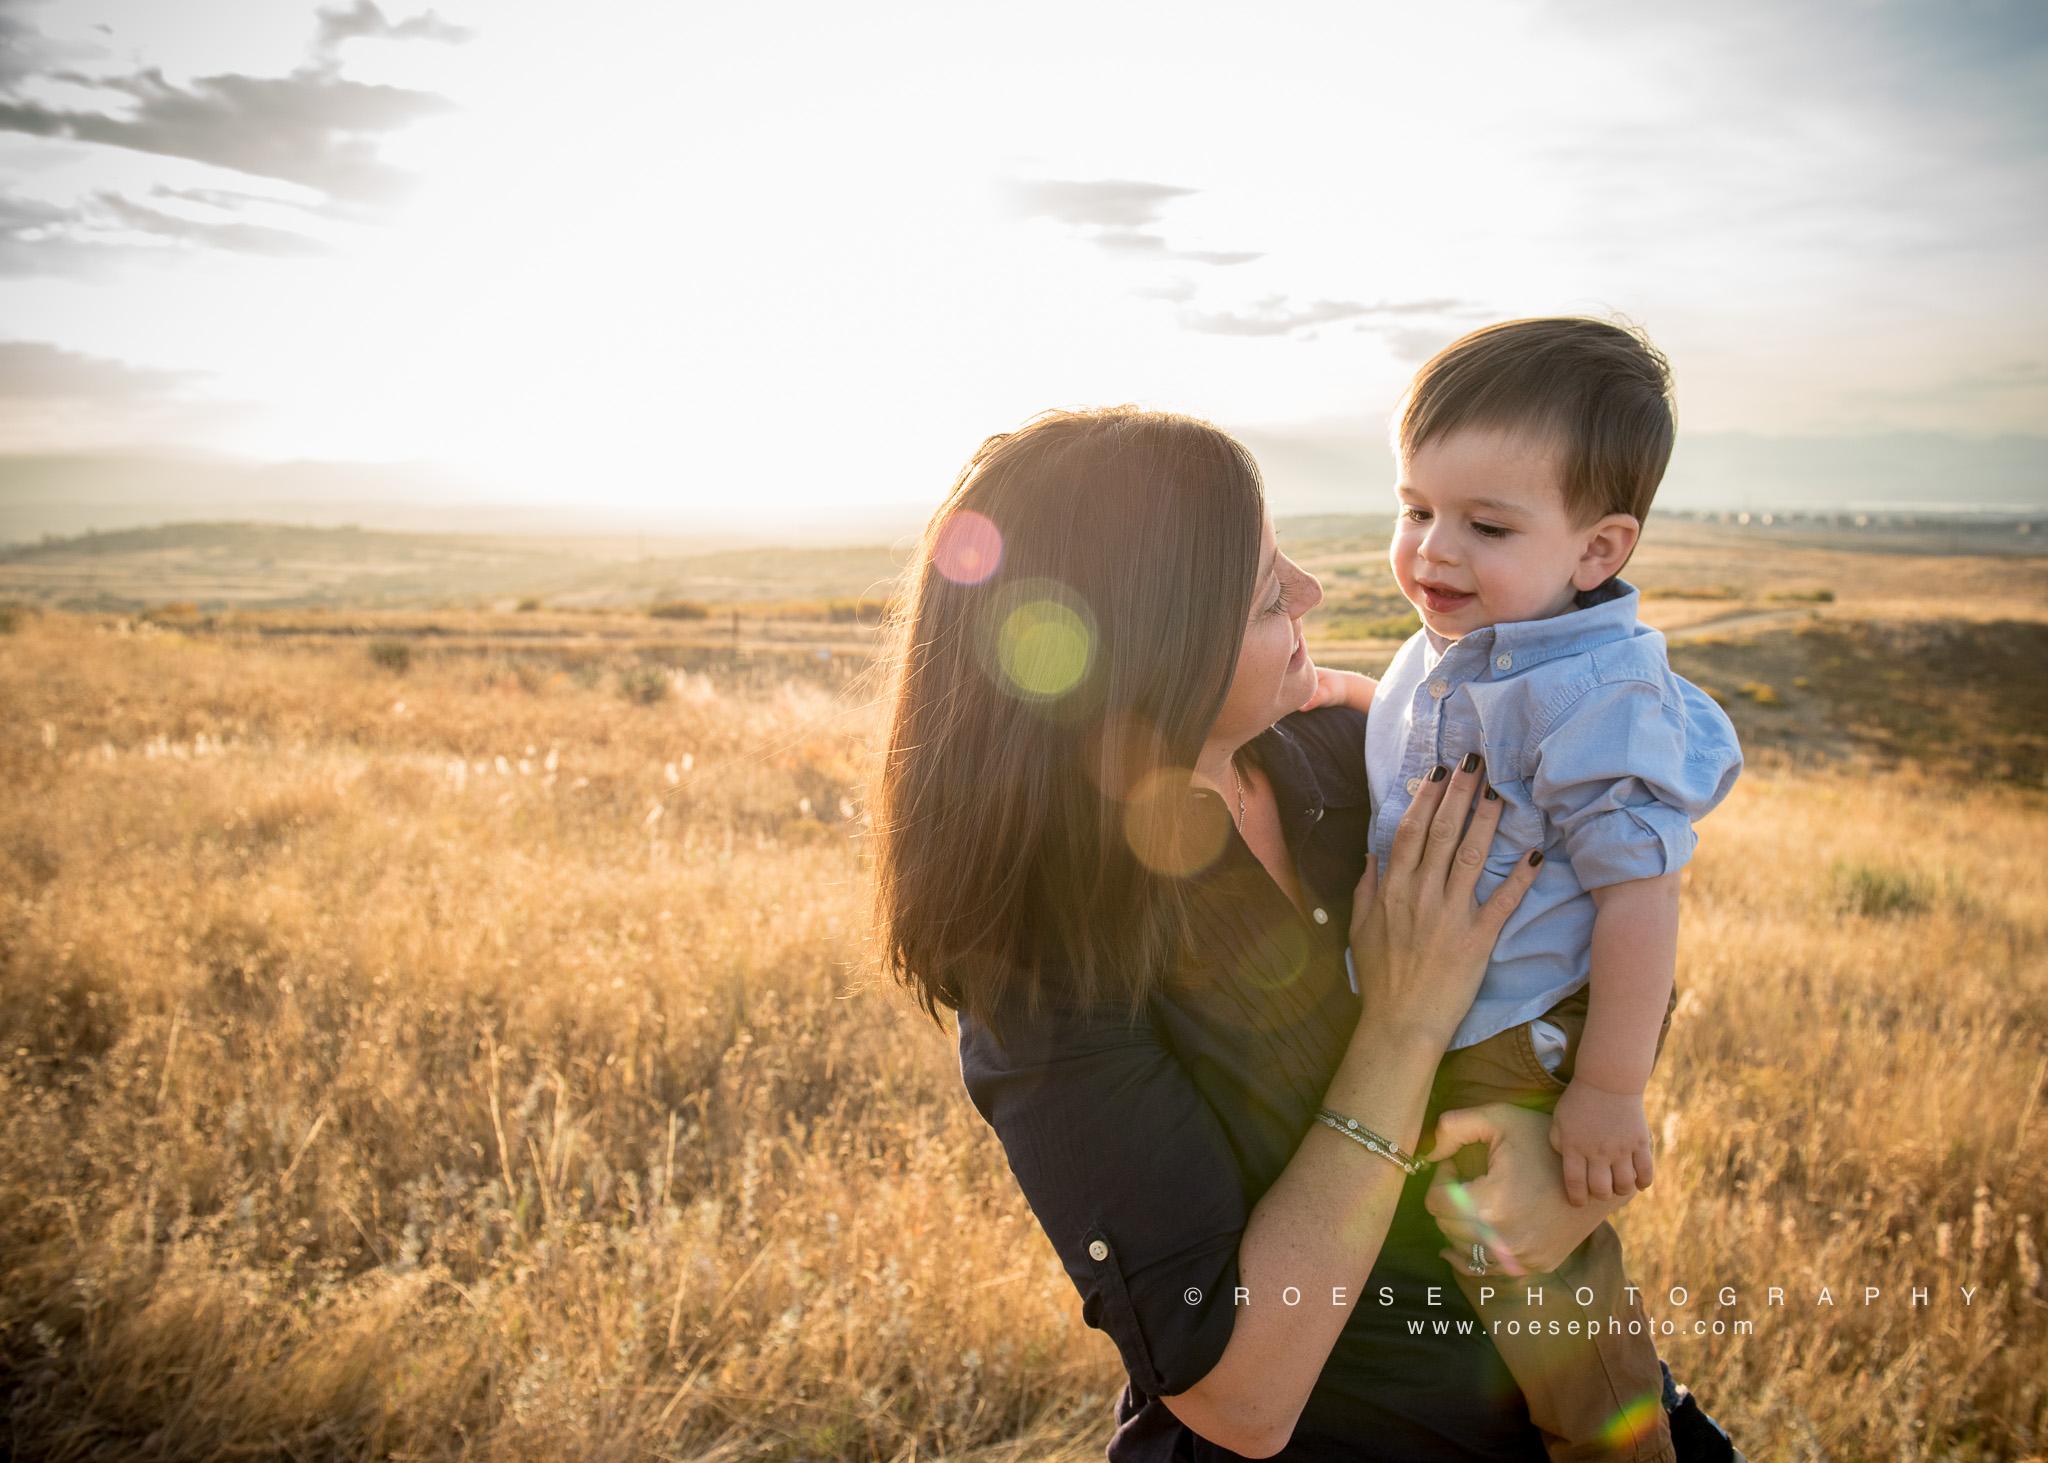 C.-Roese-Ramp-Roese-Photography-LLC.-Bennett-Family-6.jpg